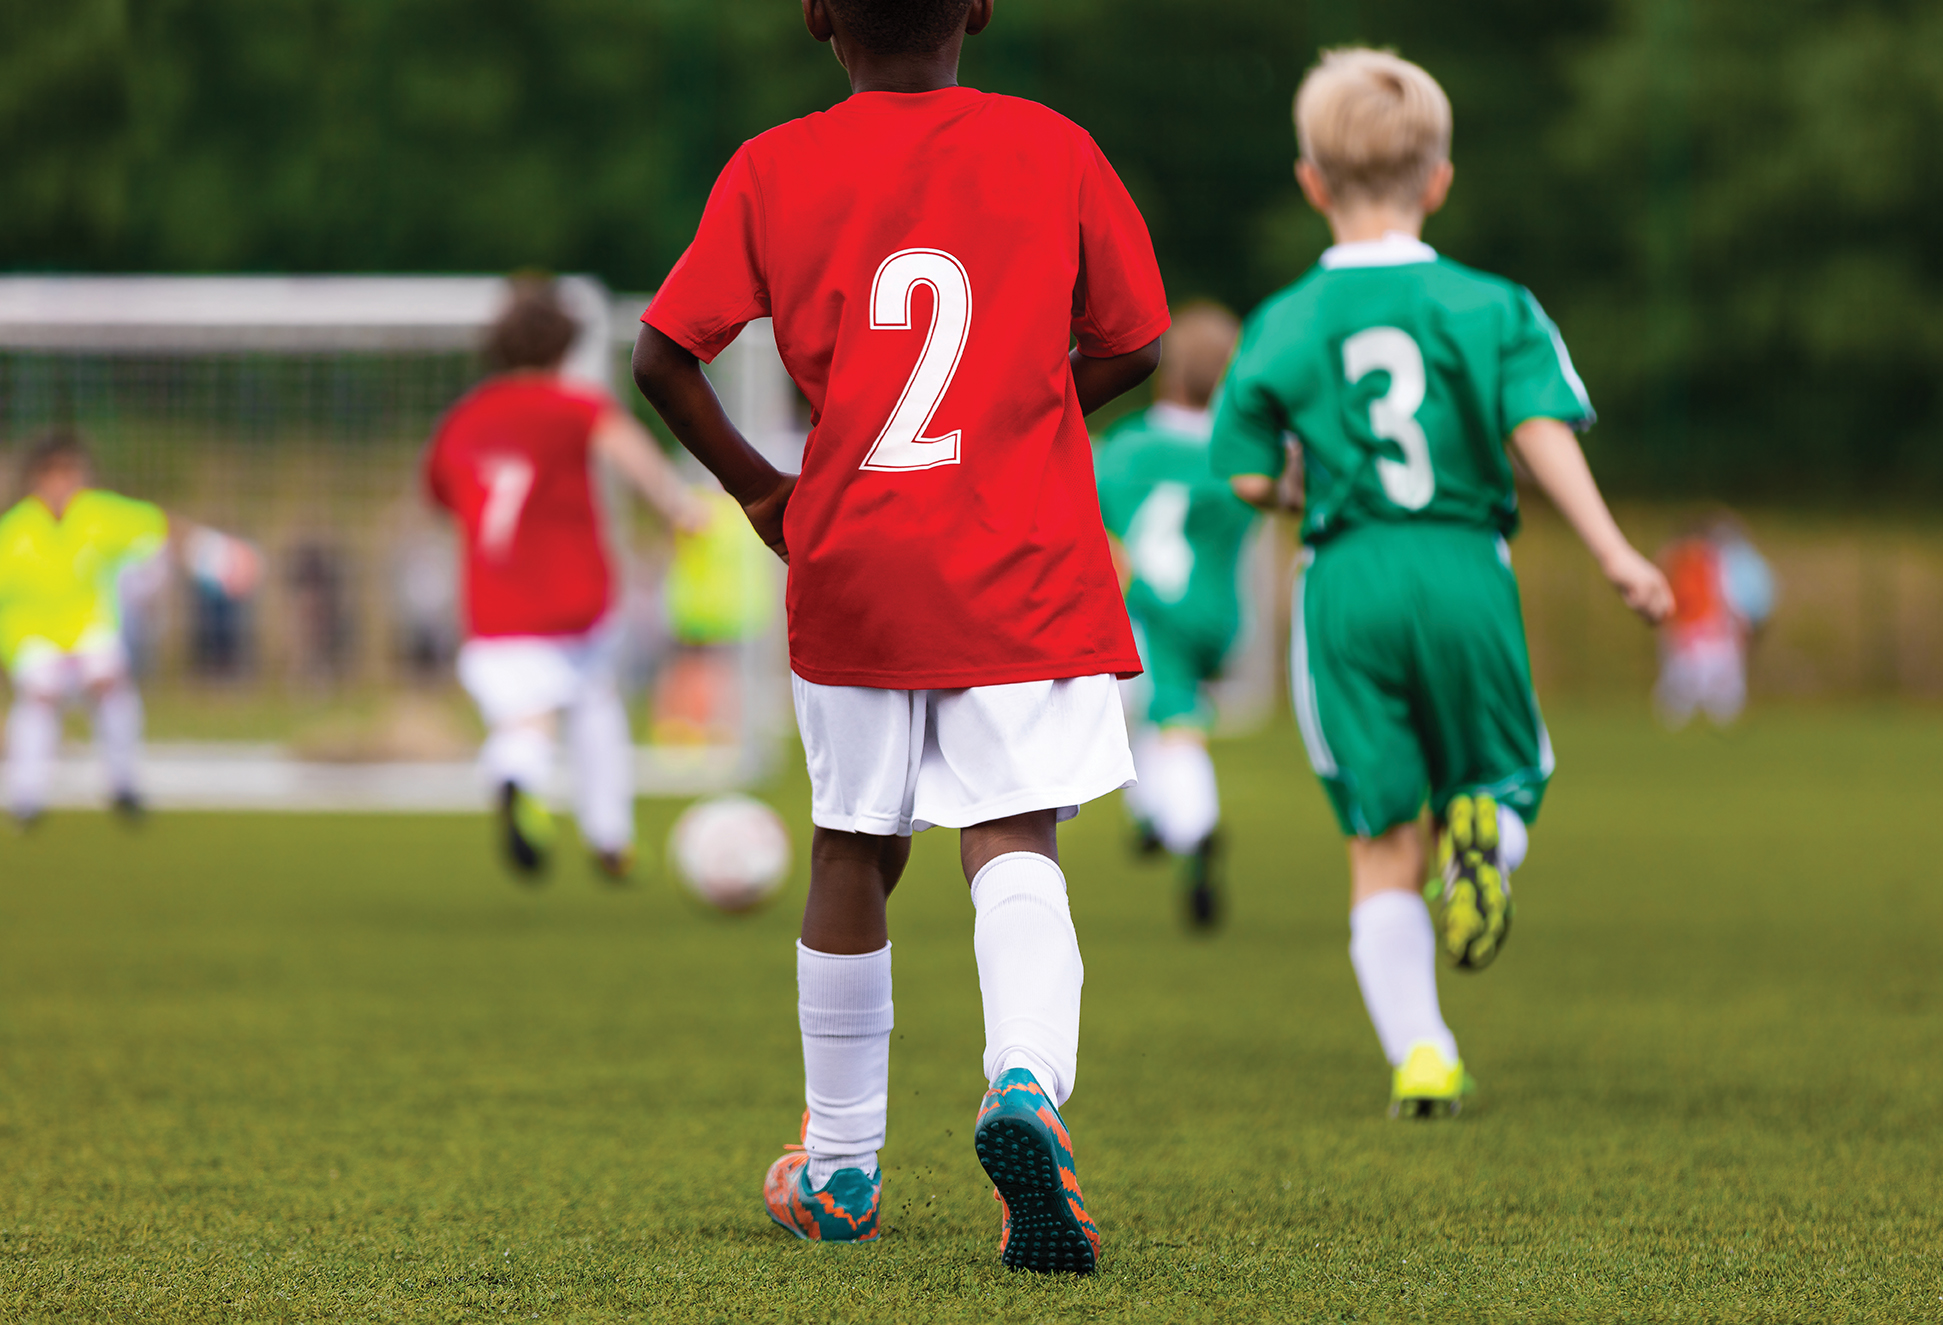 bigstock-Multiracial-Kids-Kicking-Footb-266830795.jpg